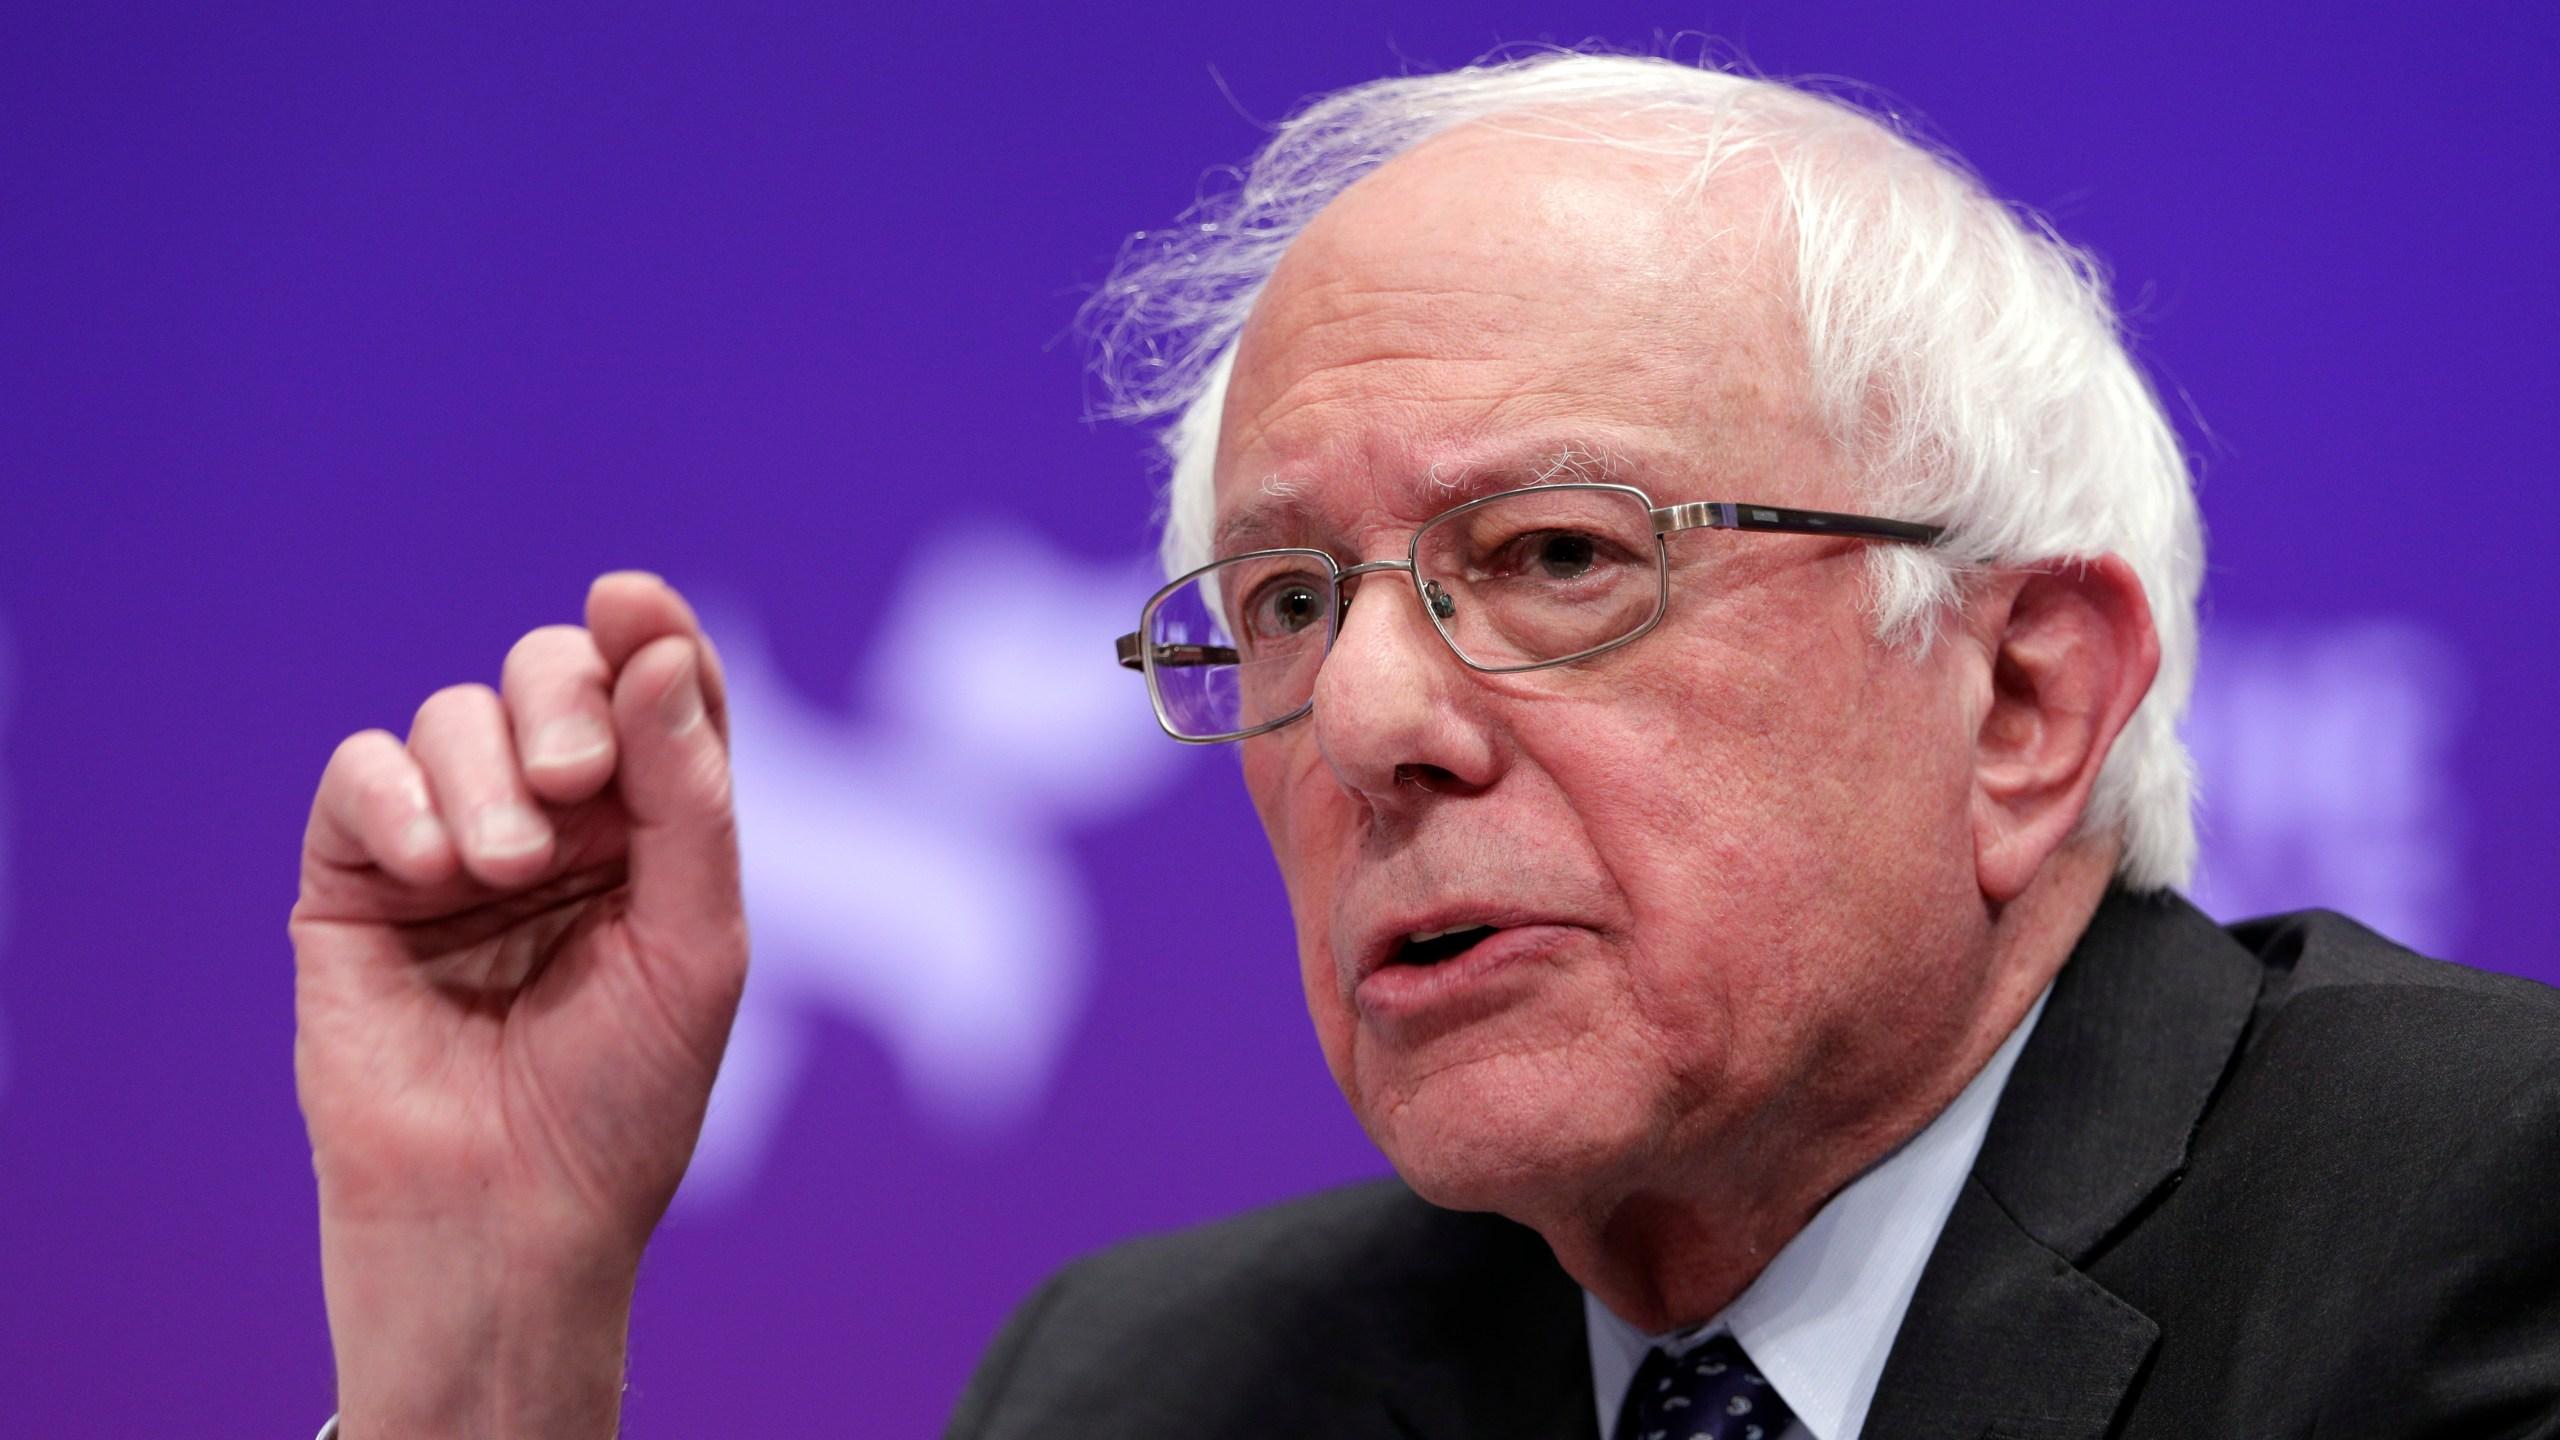 Election_2020-Bernie_Sanders-Agriculture_74356-159532.jpg88066163